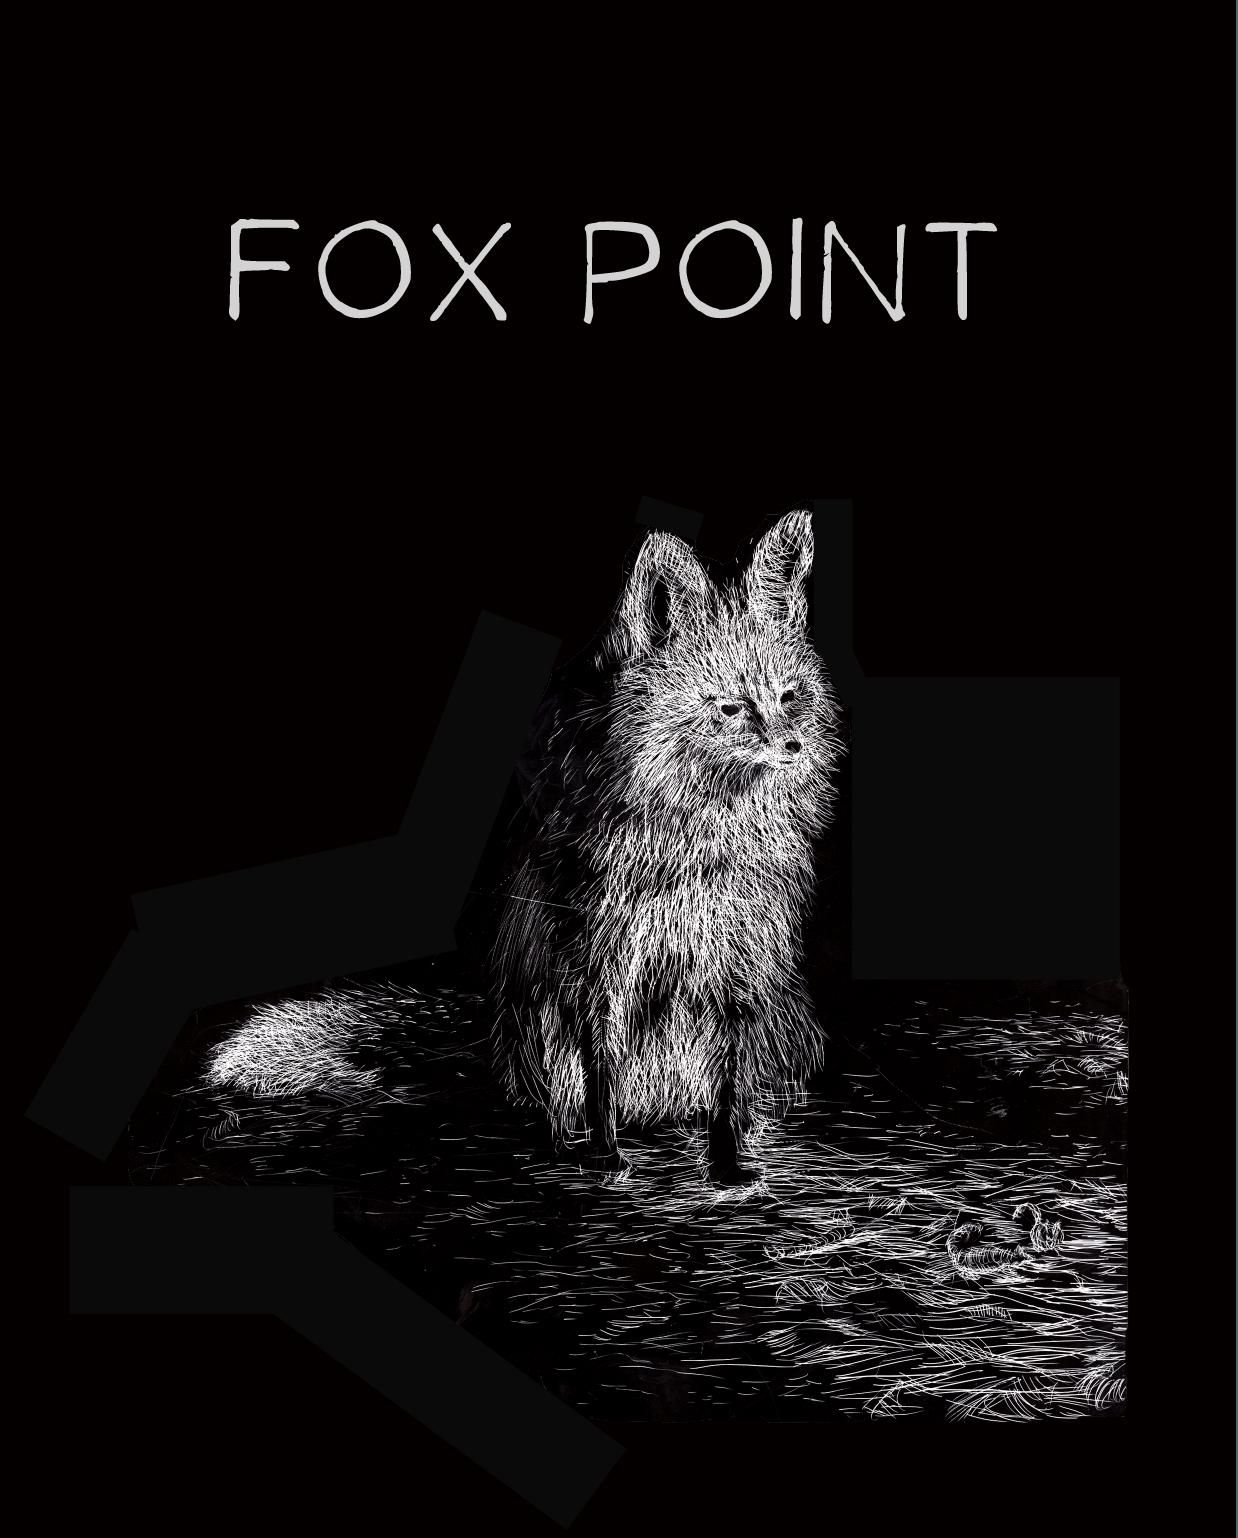 Image of Fox Point Fox 8x10